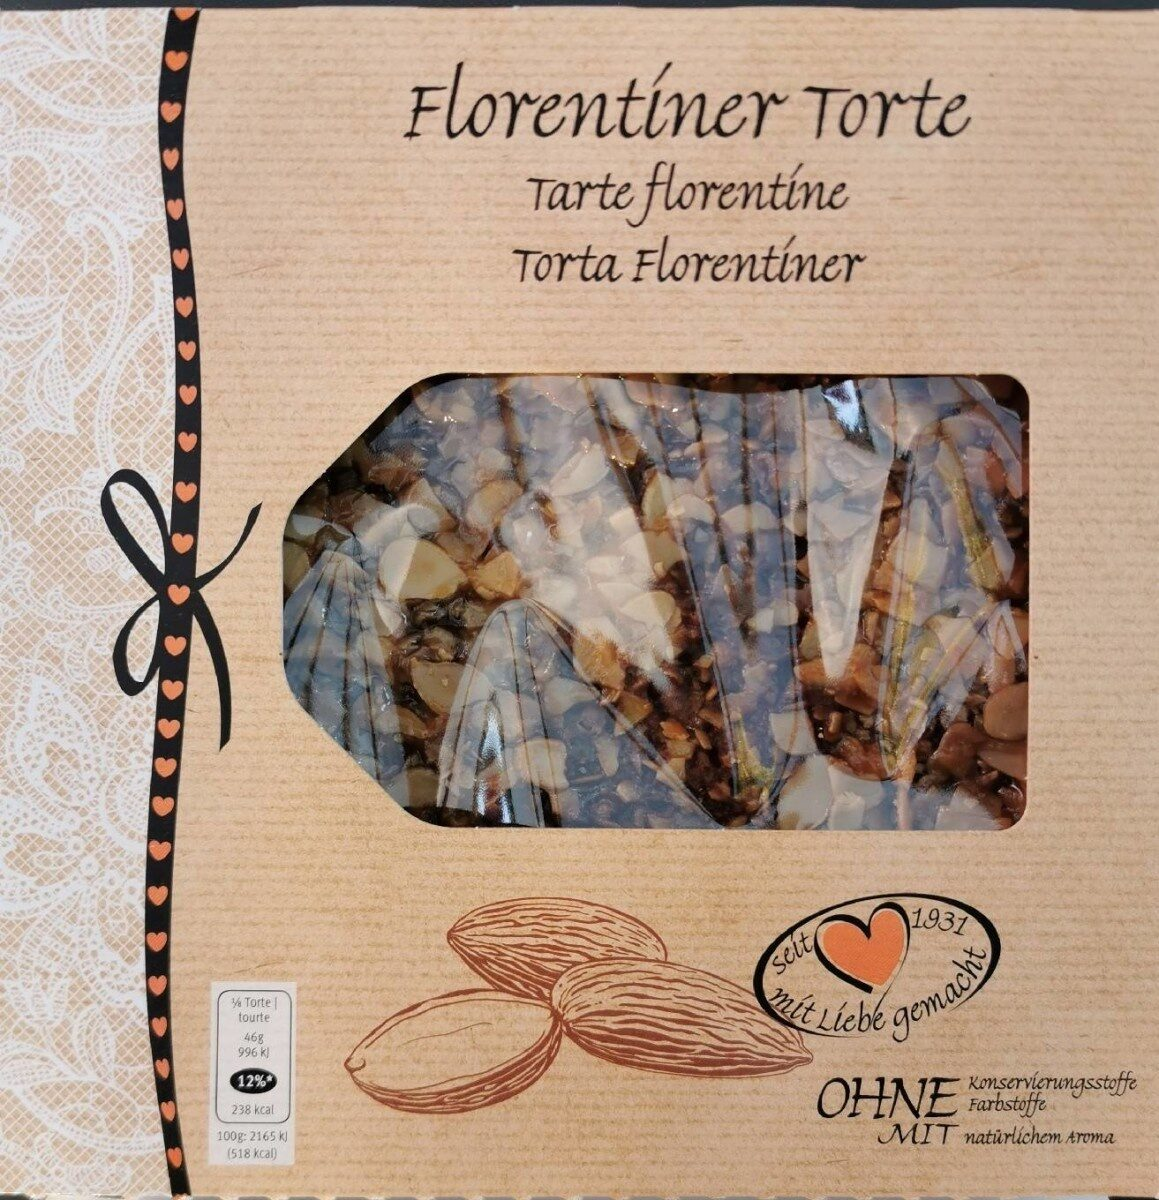 Tarte florentine - Product